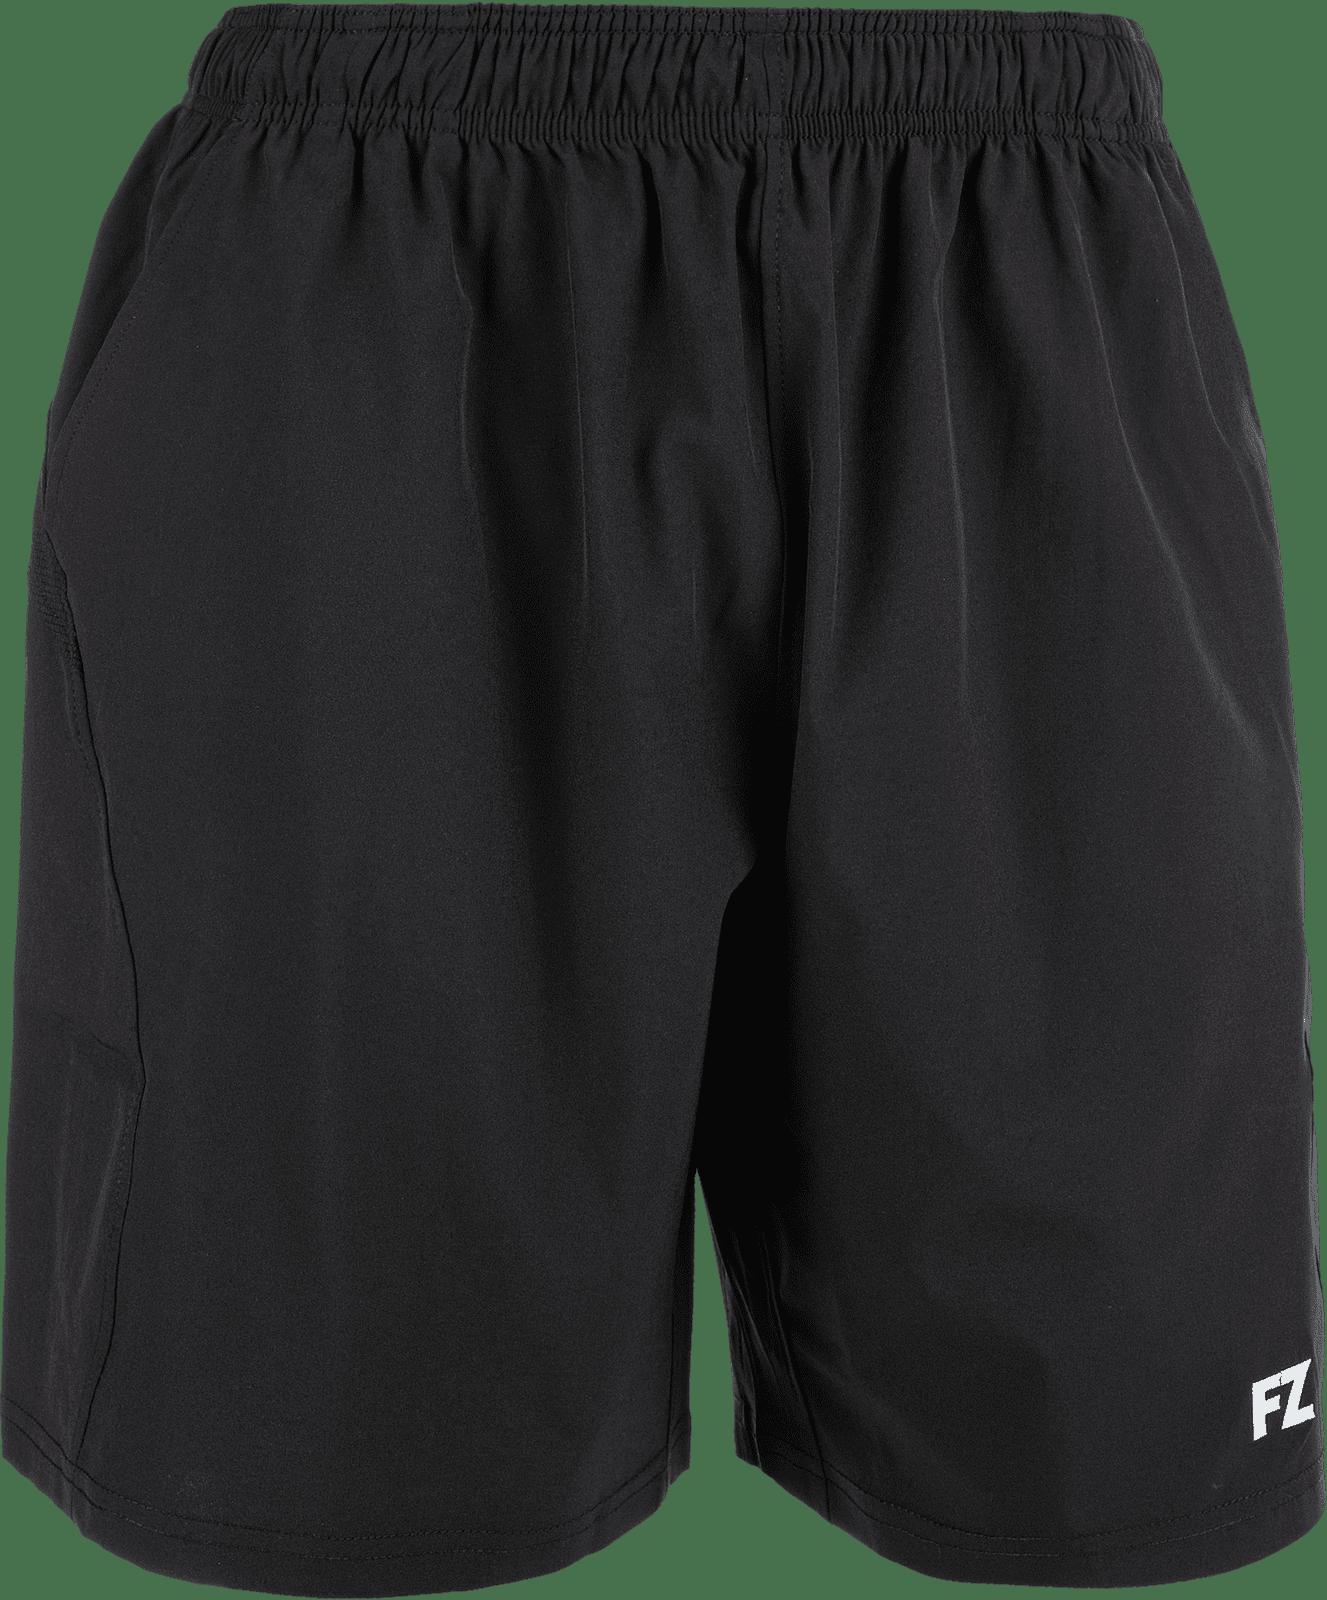 Forza Ajax Shorts Adult, 0008 Black